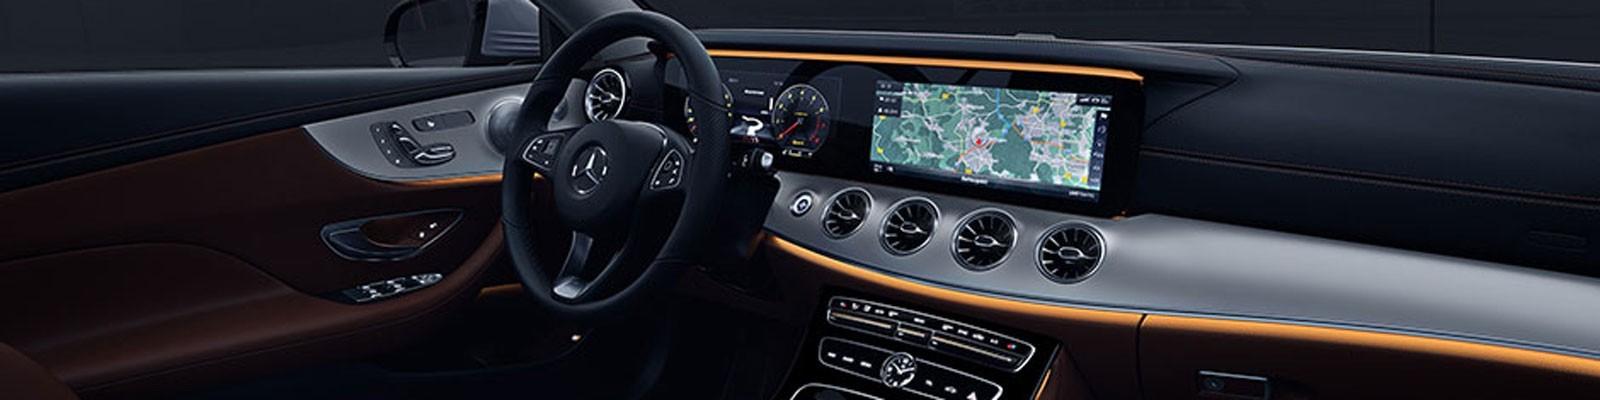 2018 mercedes benz e class coupe riverside mercedes benz for Mercedes benz lease specials orange county